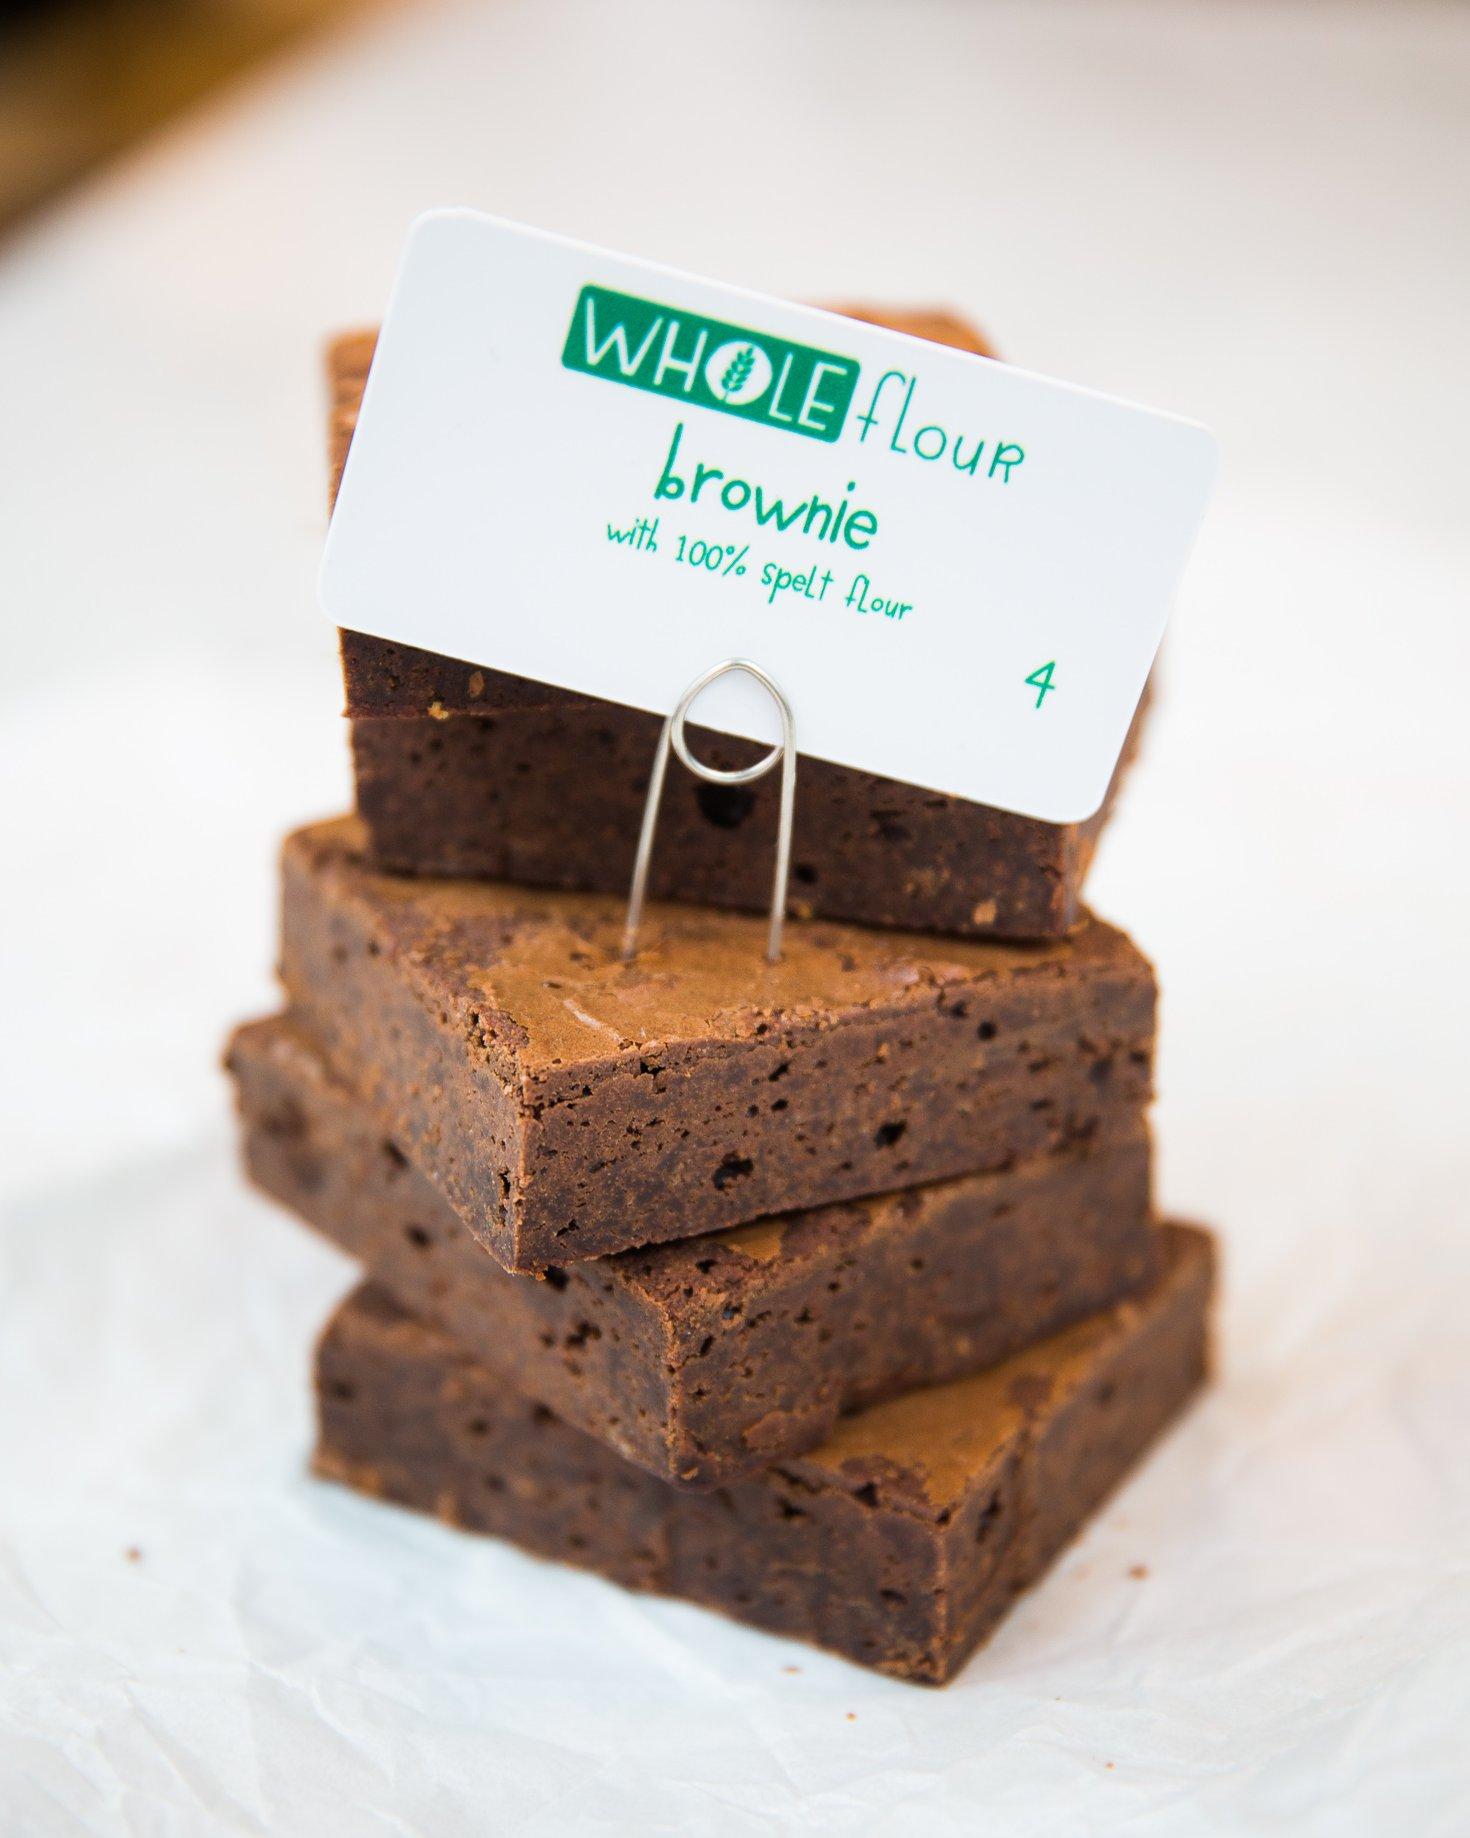 WHOLEflour Brownies Made From Whole Grain Spelt Flour. Image Courtesy of Flour Bakery.